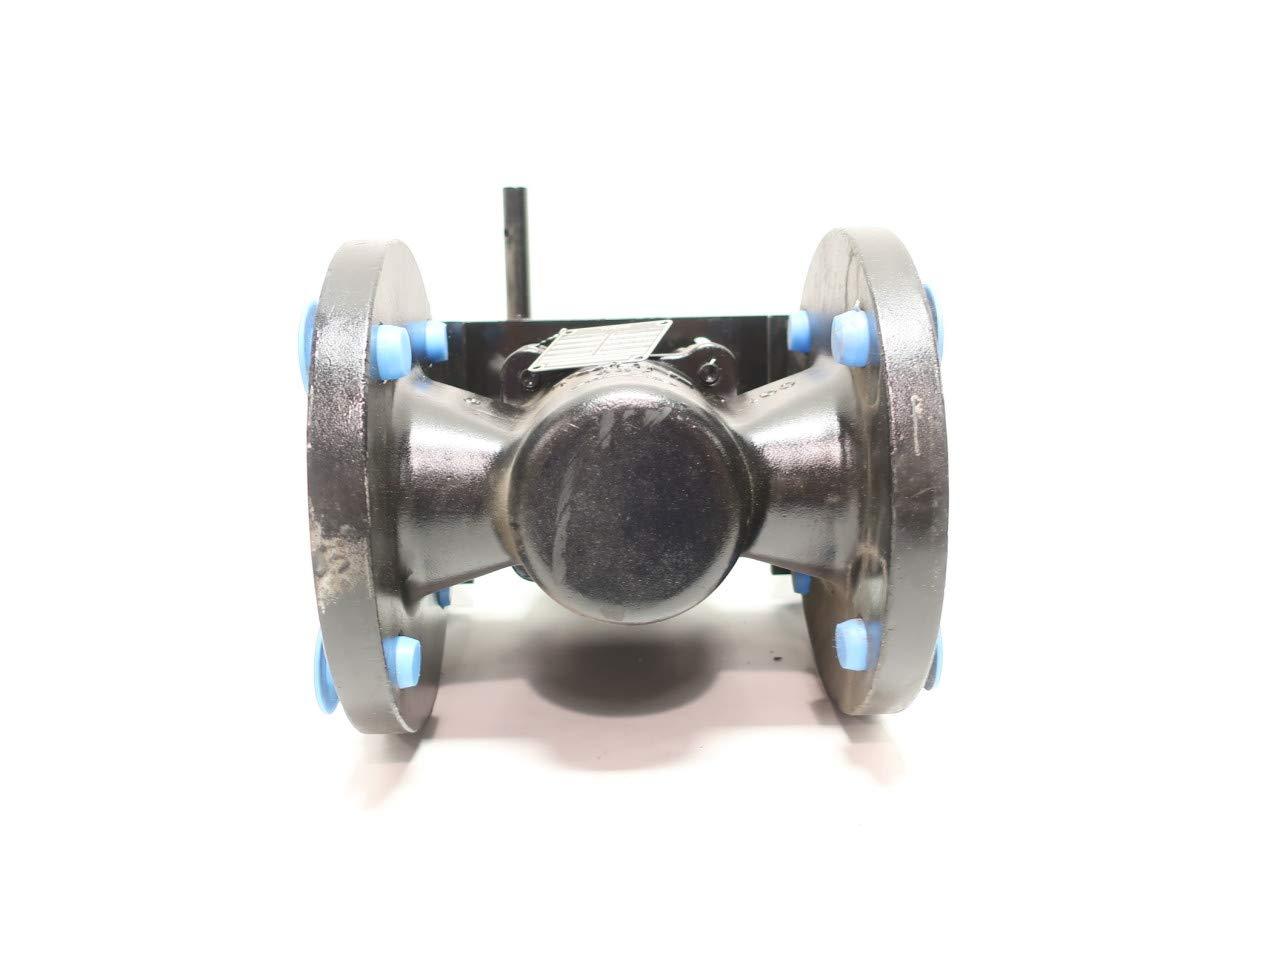 XOMOX 067 TUFLINE 150 Steel FLANGED 3IN Plug Valve R696882